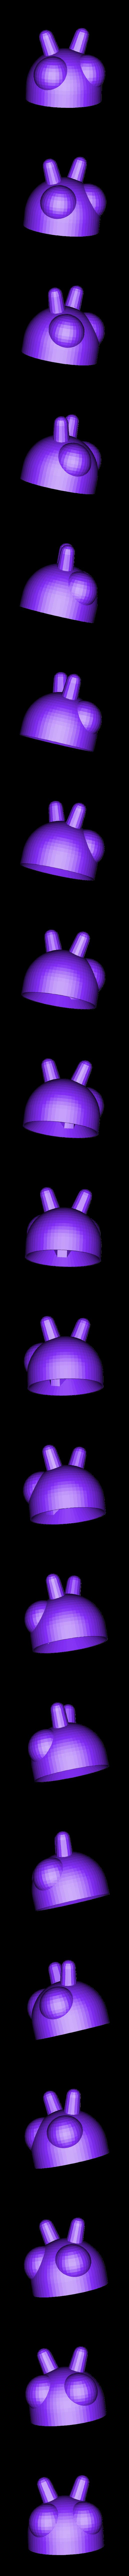 mtmk_trifix_caterhead.stl Download free STL file 3D Monstamaka • 3D printing design, mageli